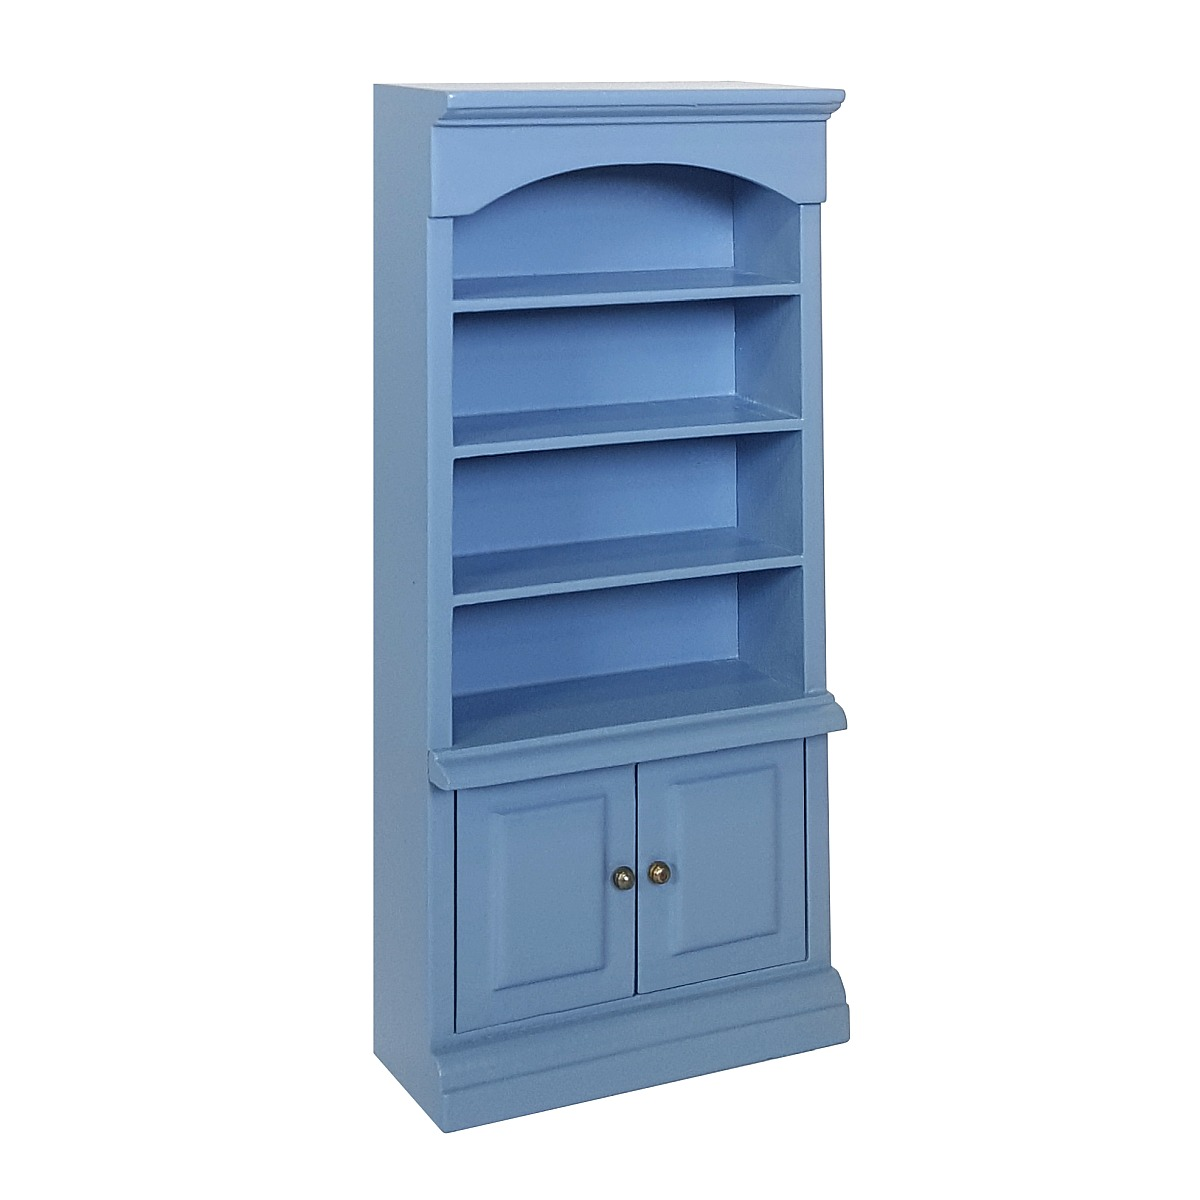 Open cupboard with underdoors, blau 完成品・ドア付きオープン食器棚、ブルー